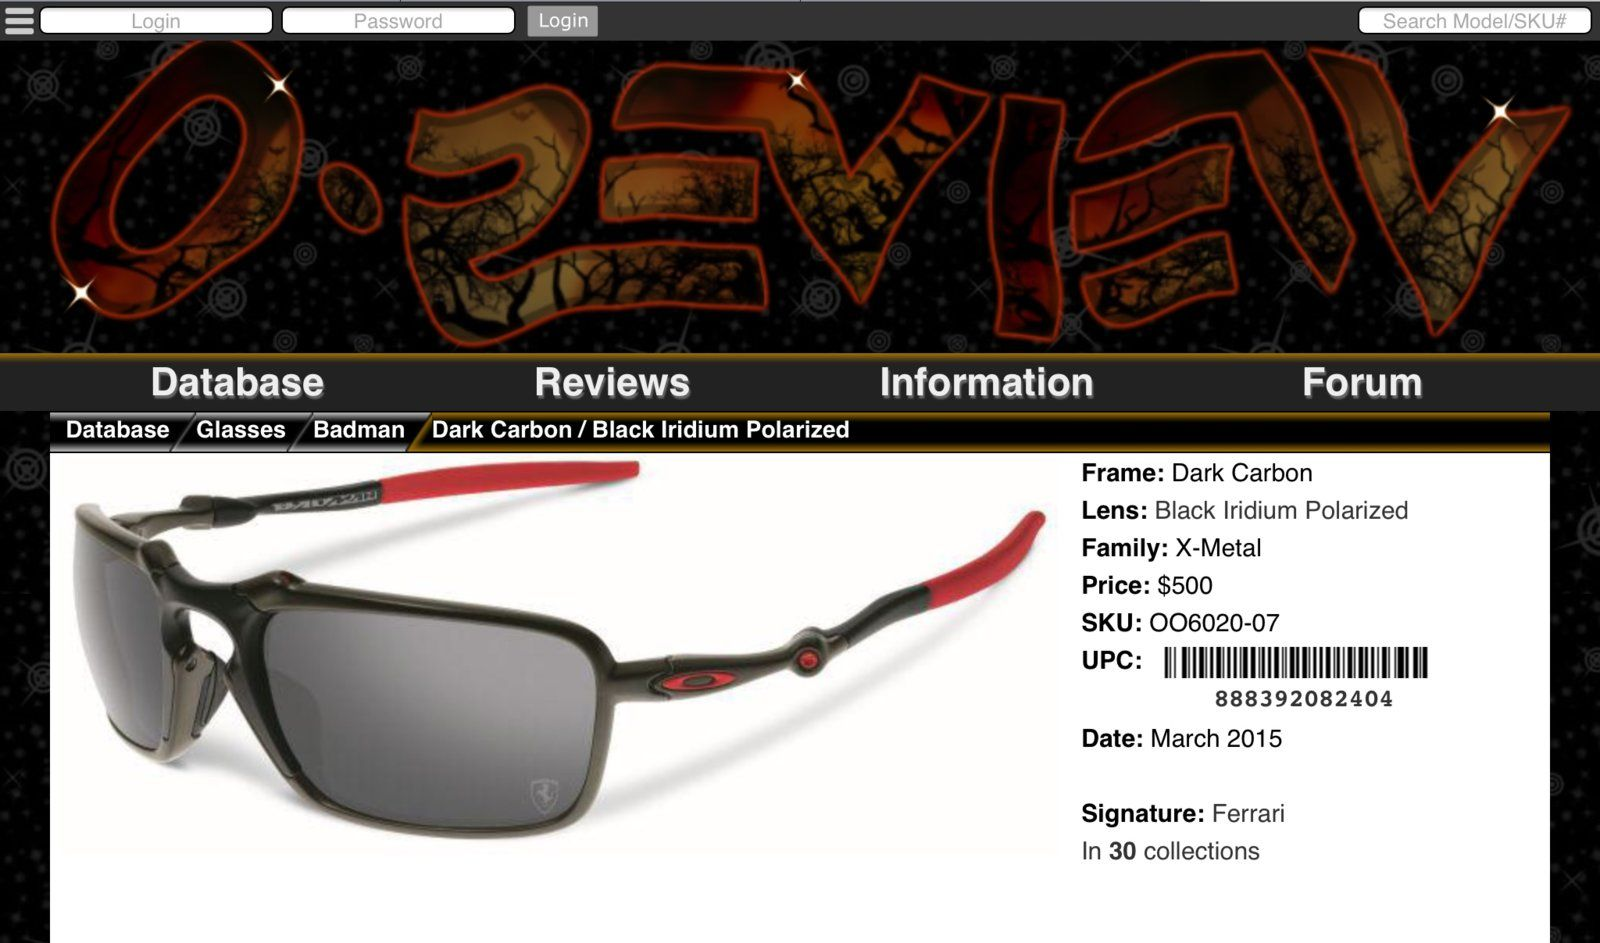 0815a2c49cd Oakley Badman Scuderia Ferrari Sunglasses (New) - 5B5EA9AA-52CD-4084-A927